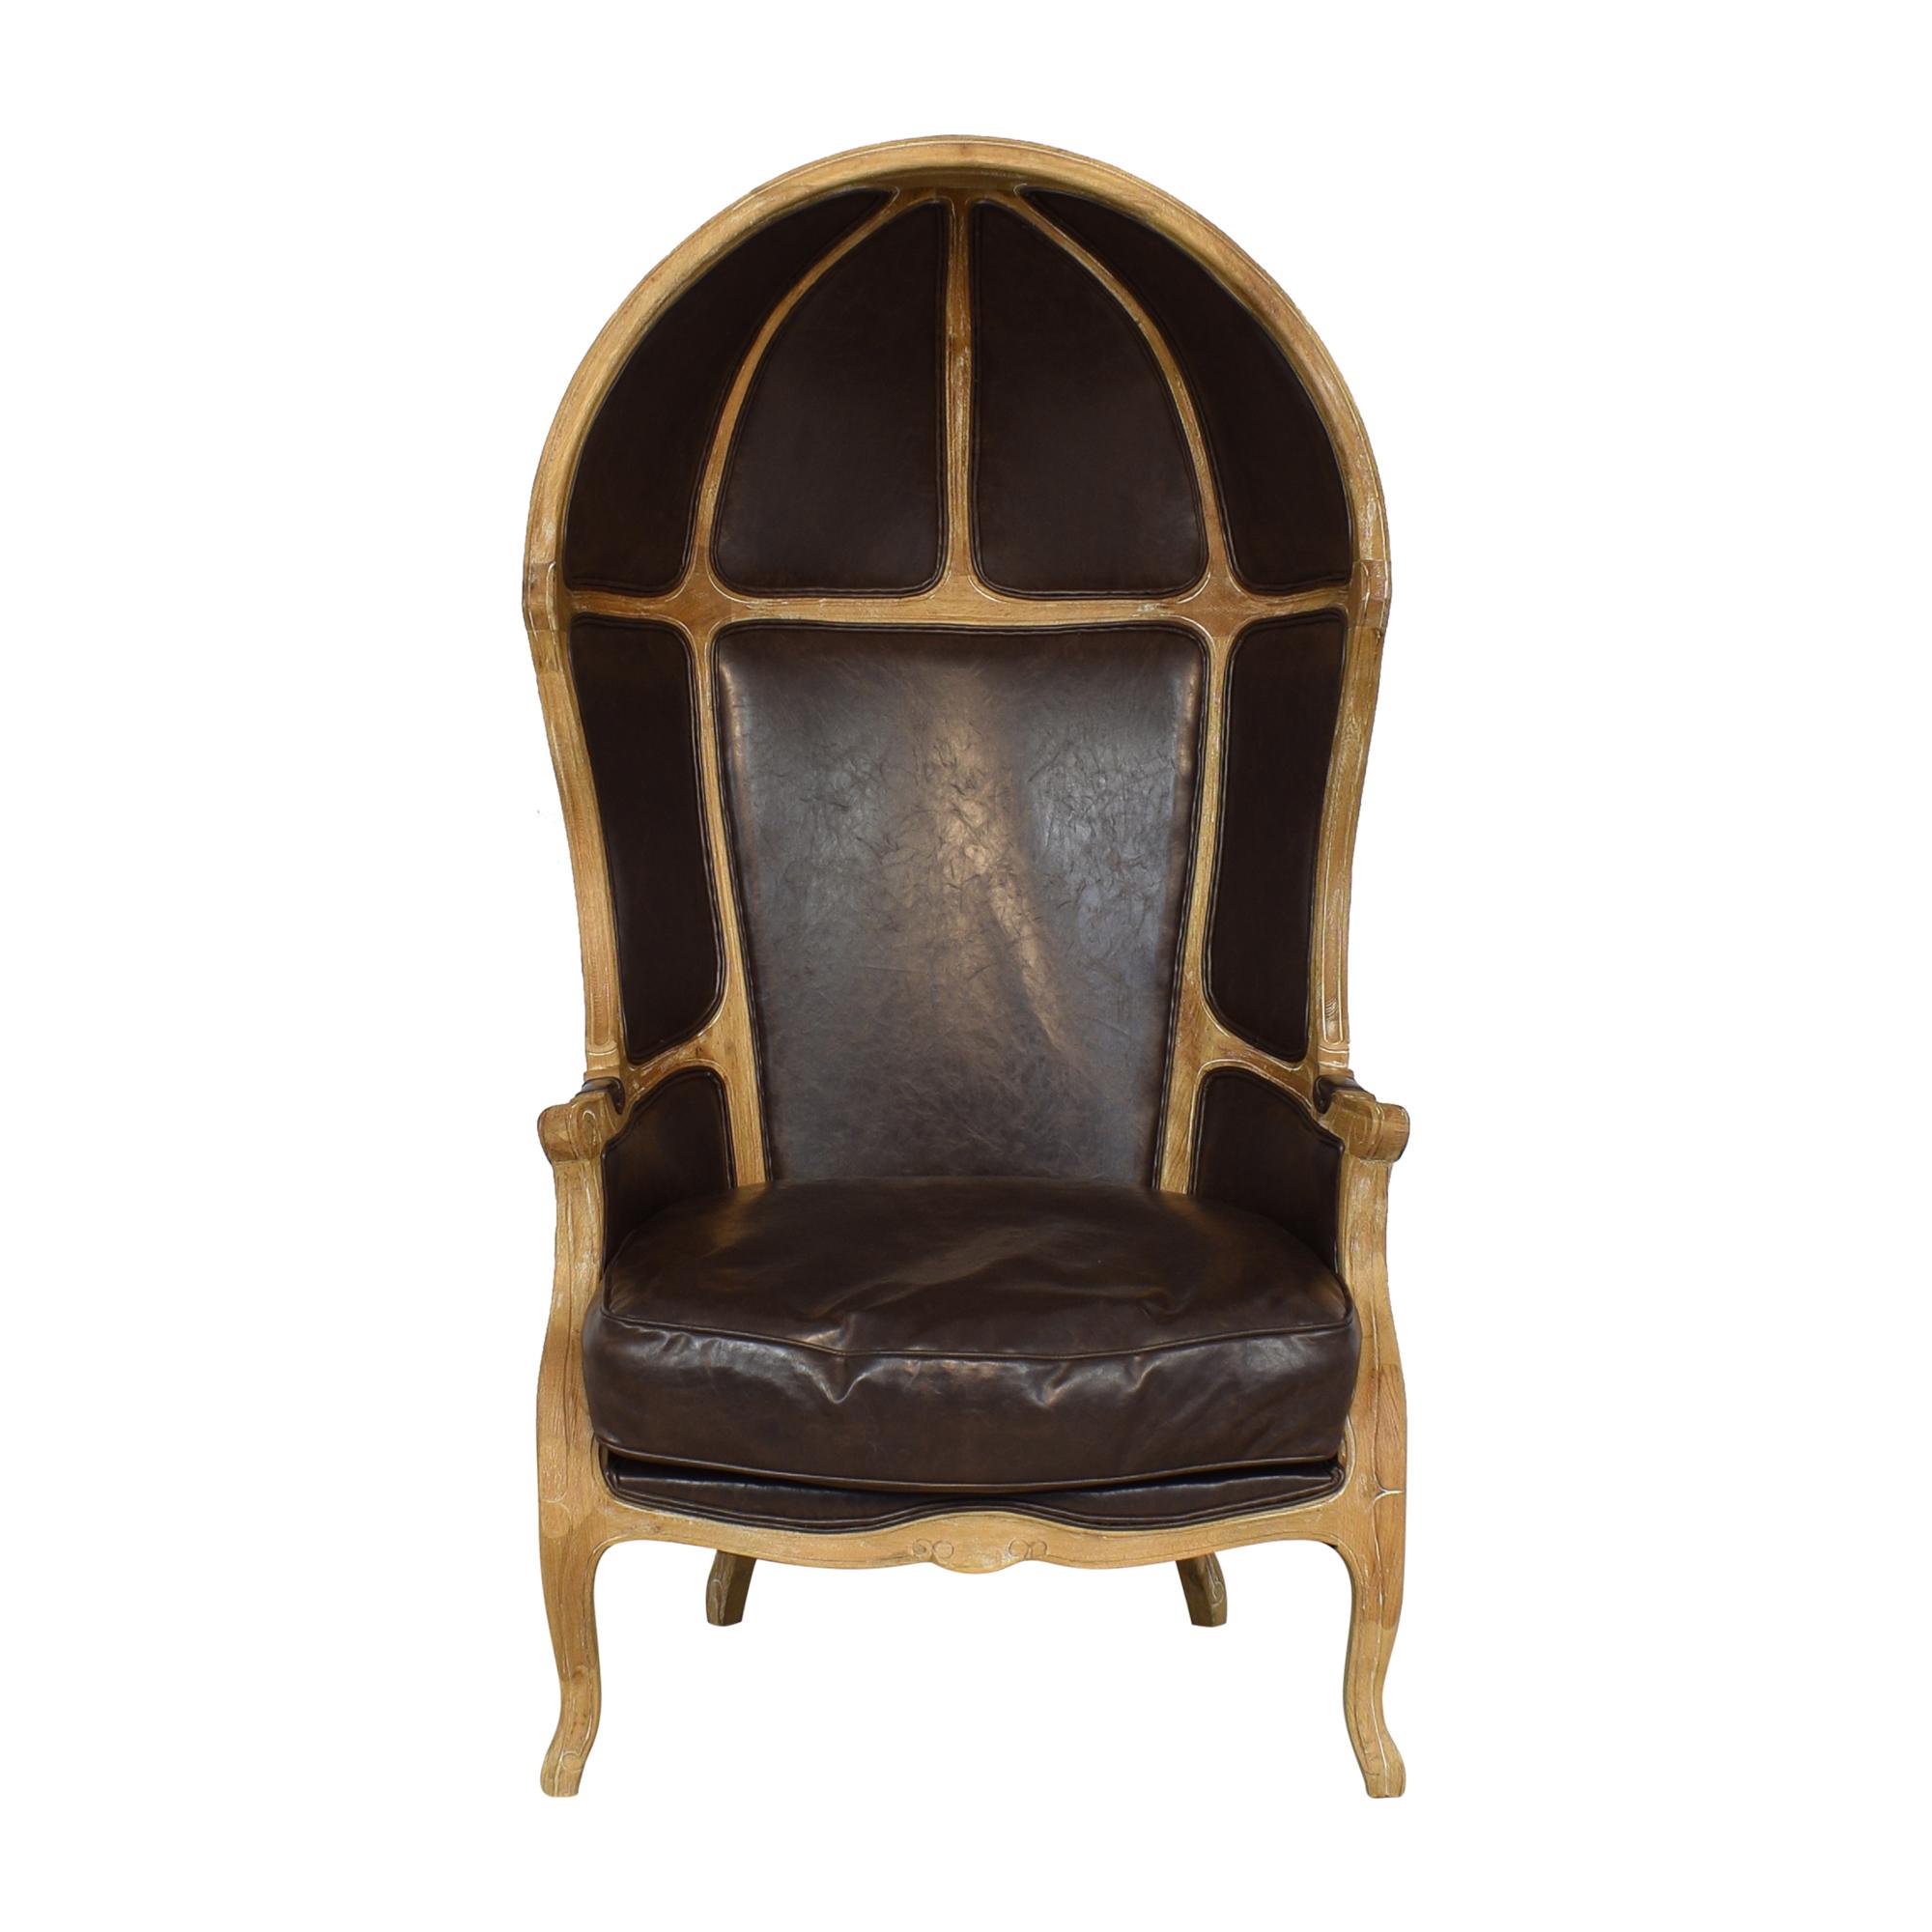 Safavieh Couture Sabine Chair / Chairs